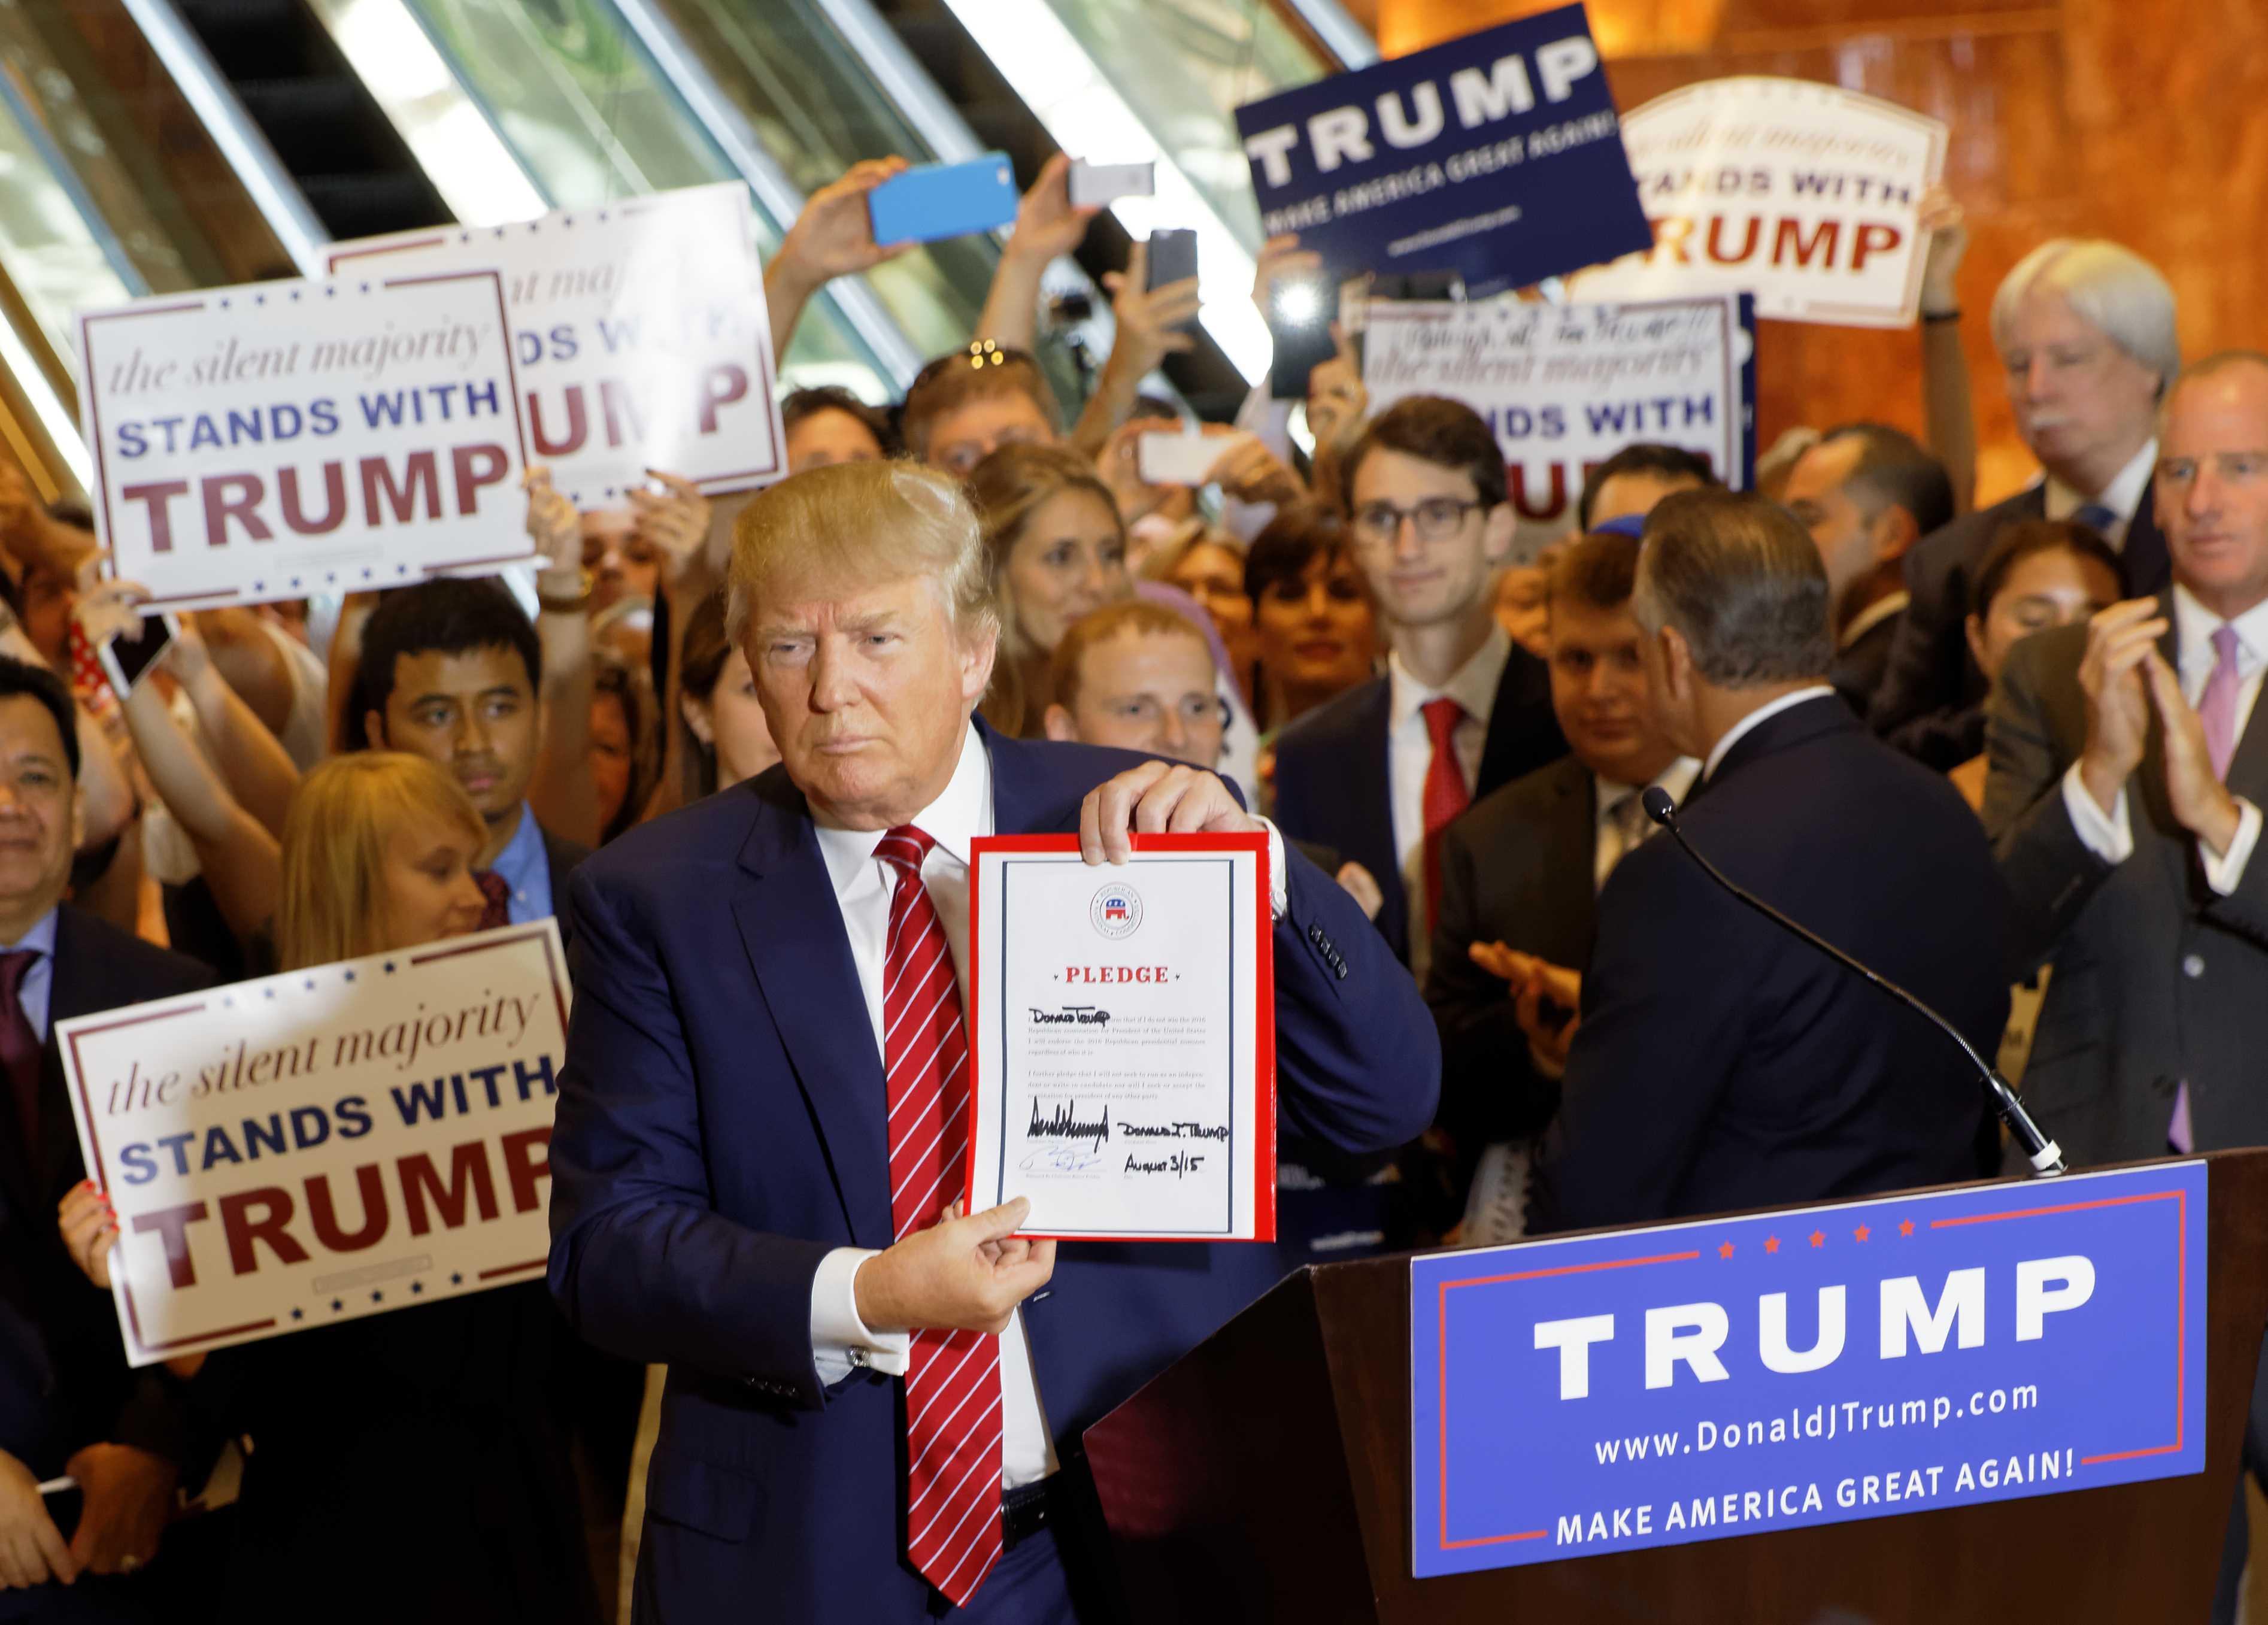 Latino views on president-elect Donald Trump